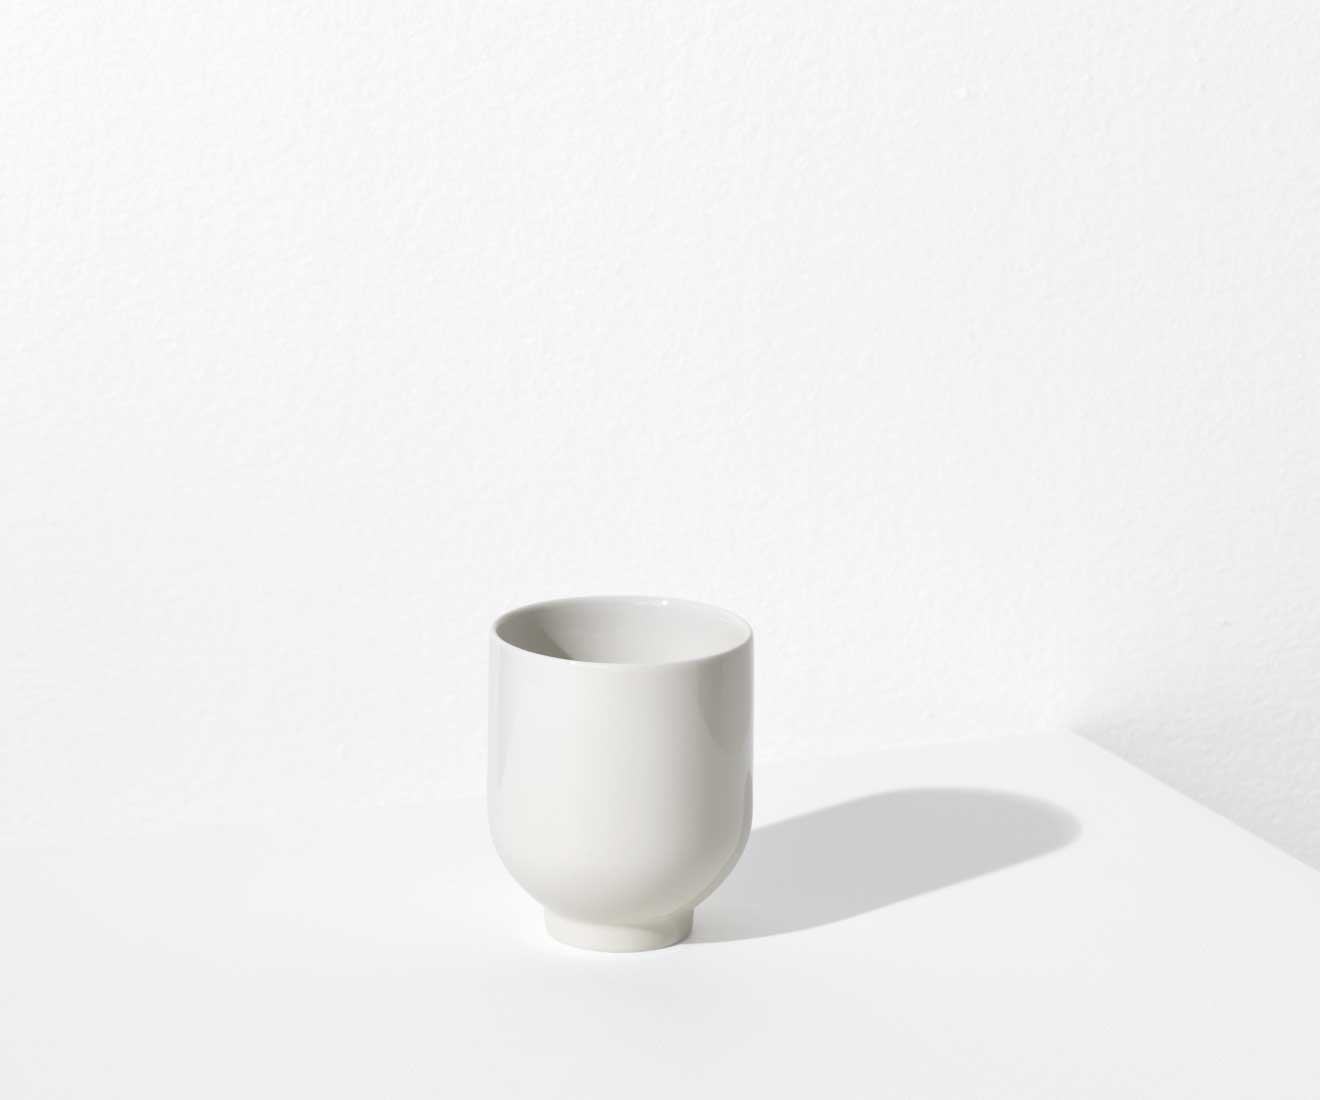 Motarasu Products - Yoko mug in white by Stilleben